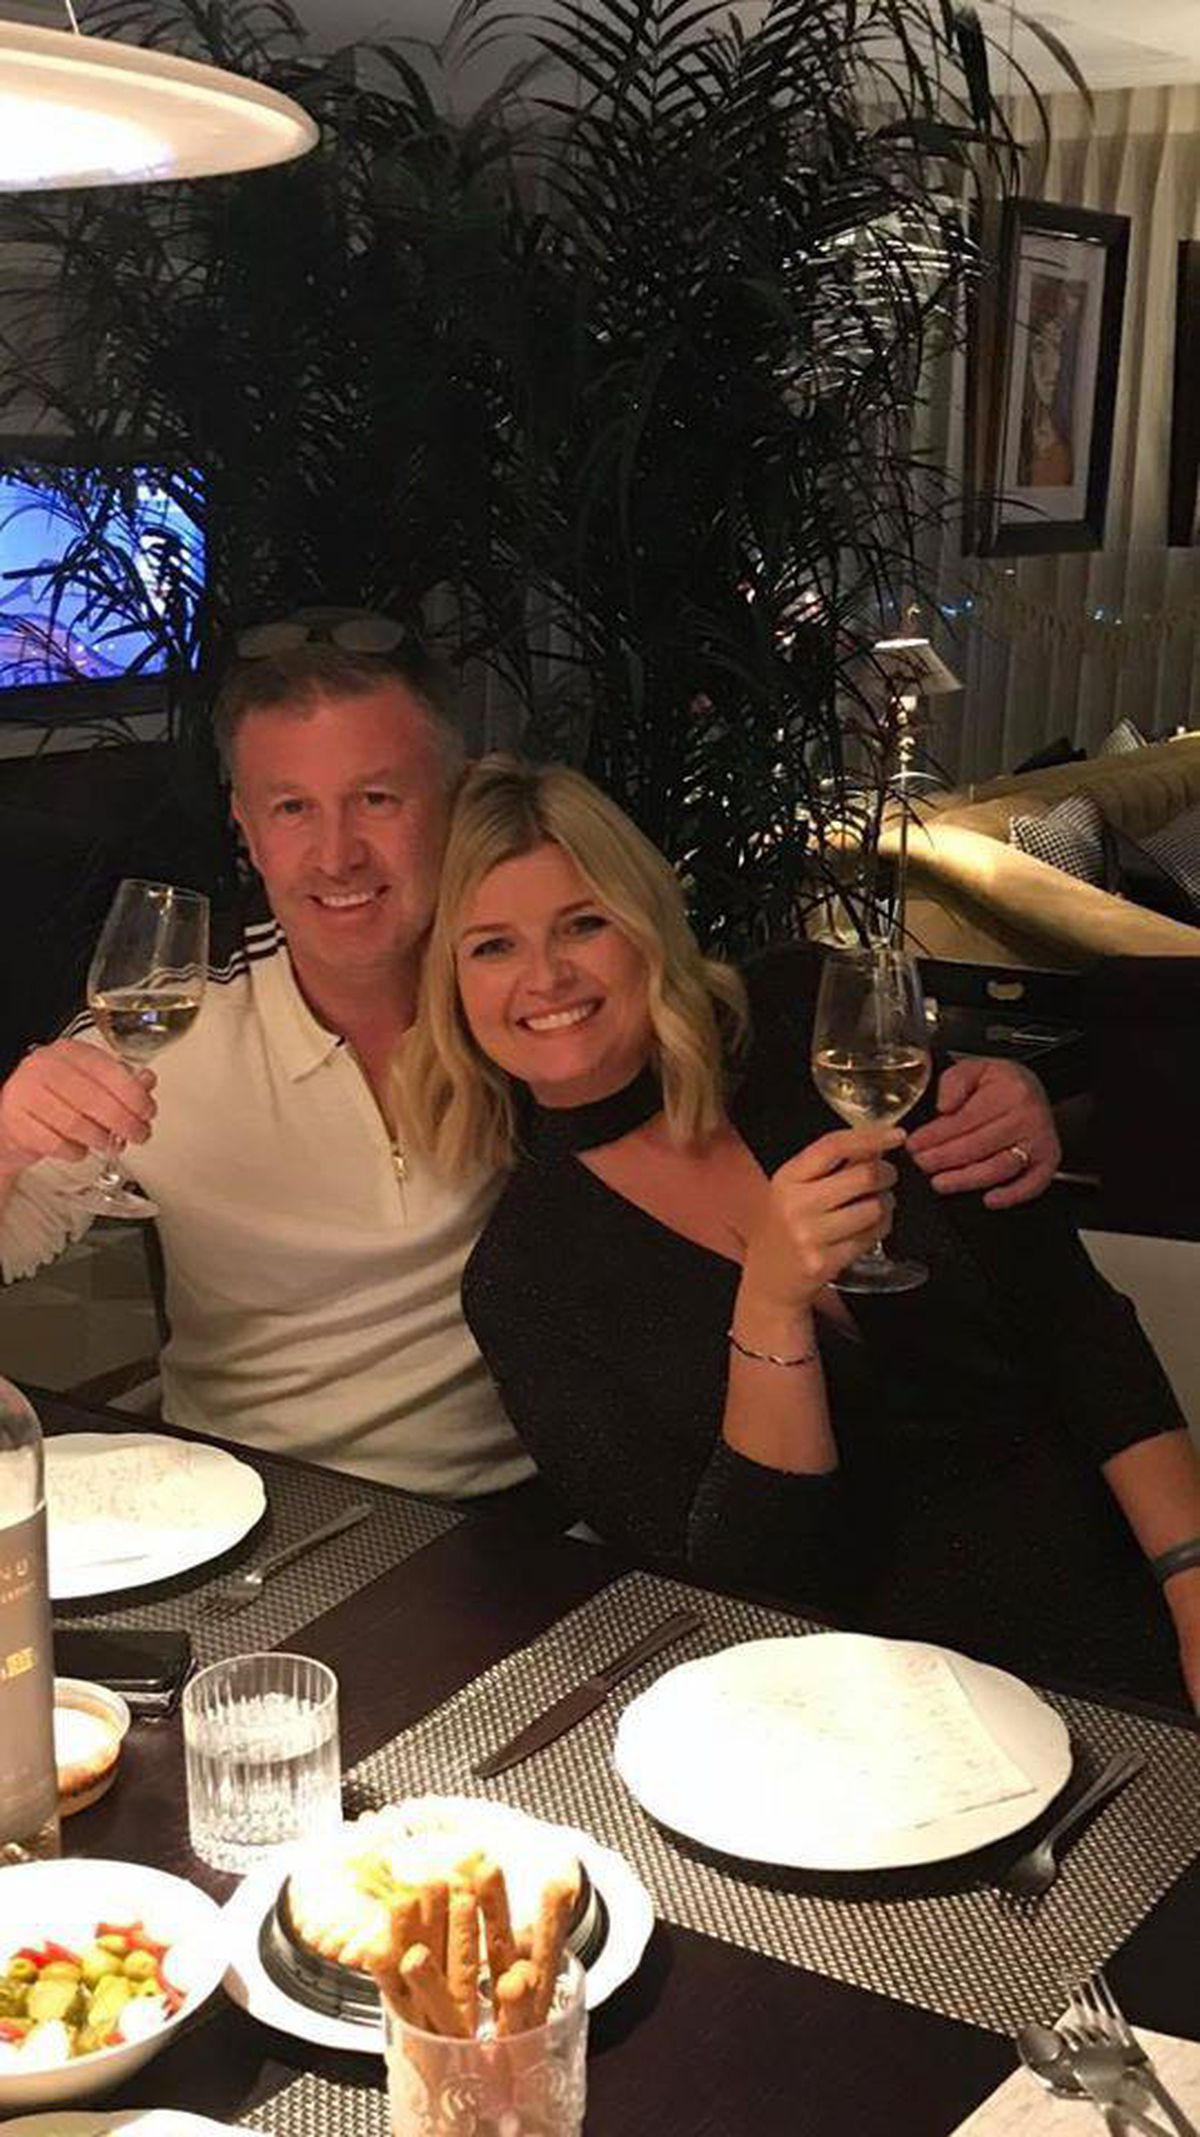 Steve Froggatt and his wife Julie